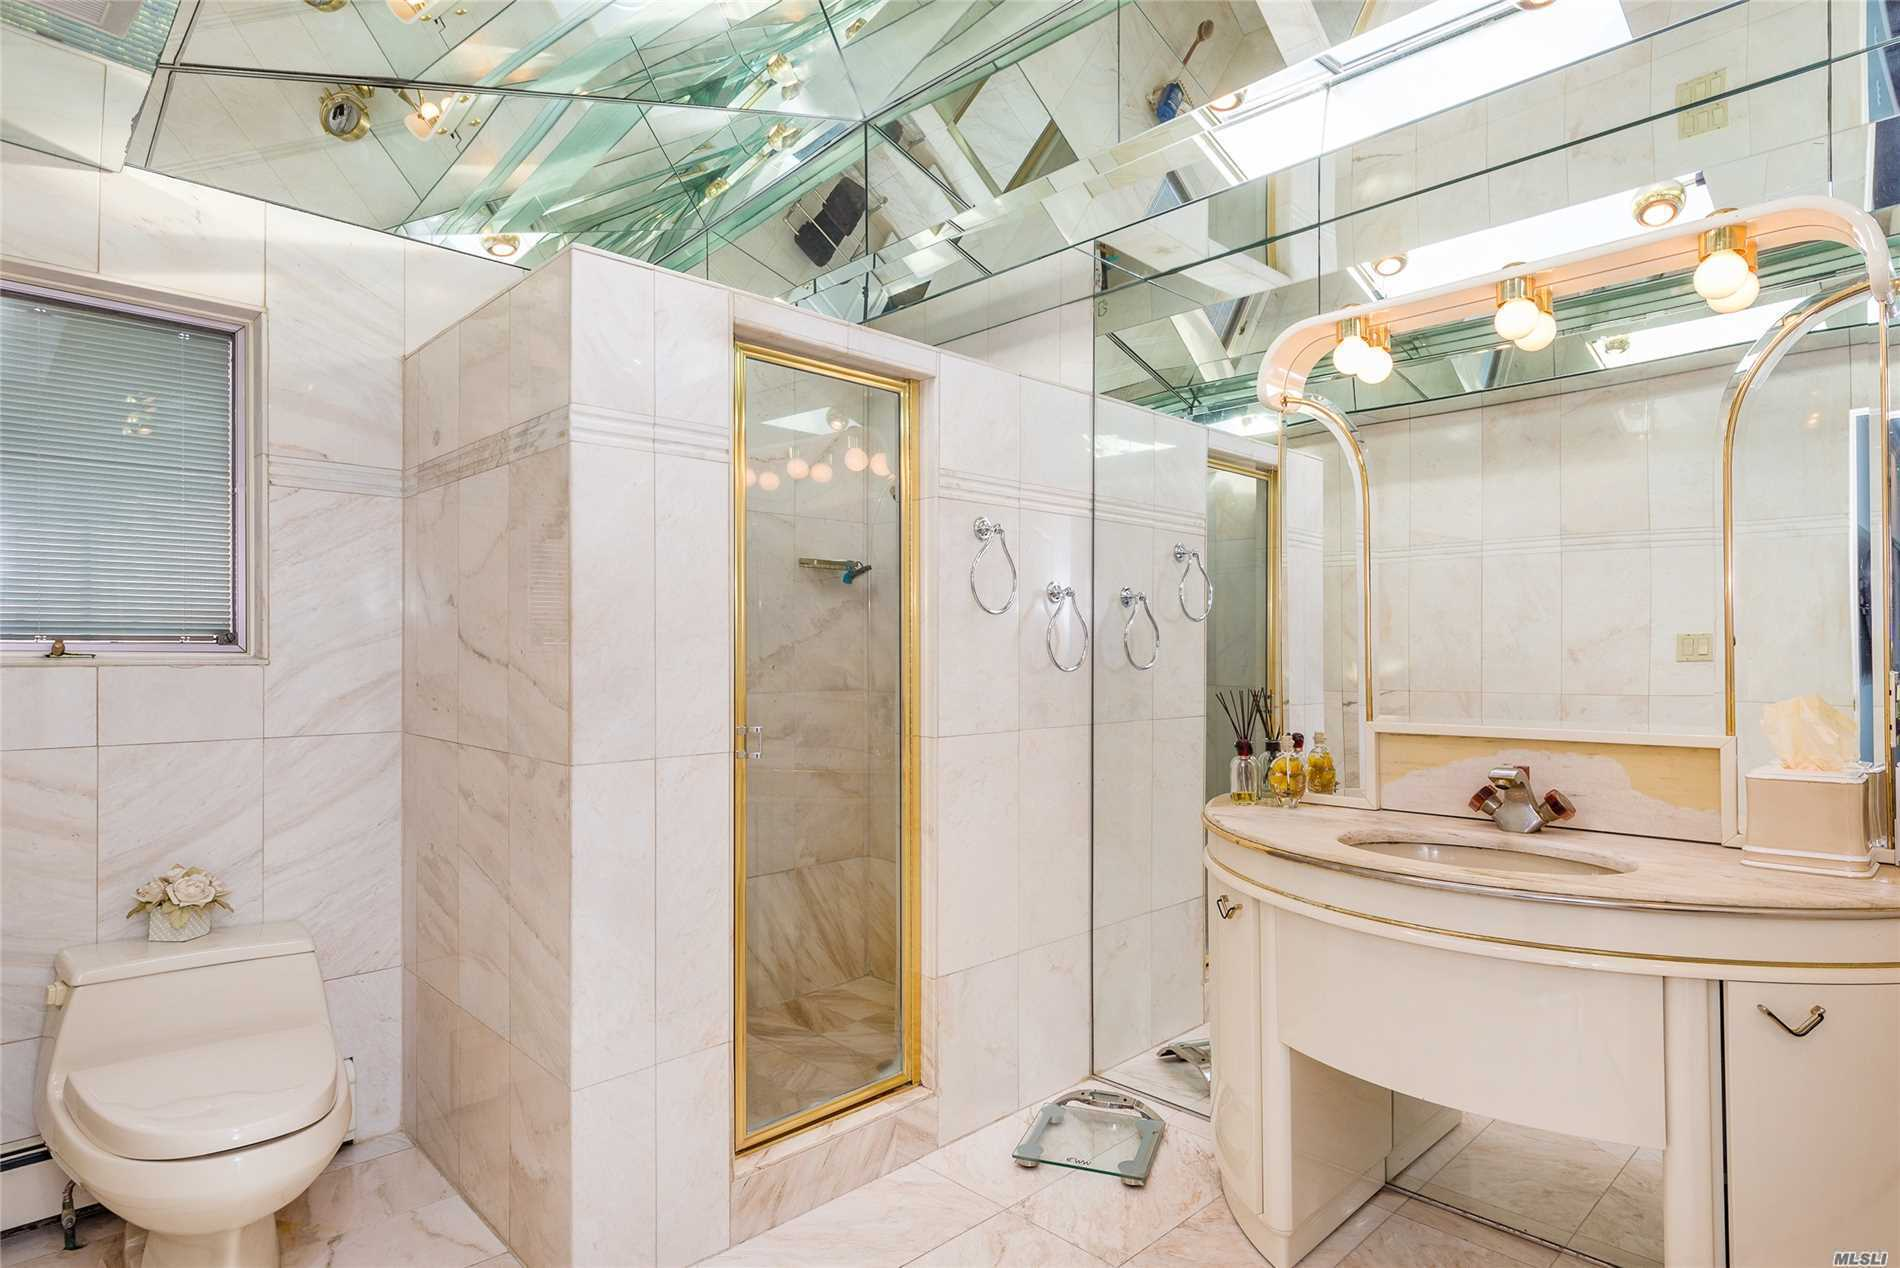 Real Estate FOR SALE - 3328 Hewlett Ave, Merrick, NY 11566 - MLS ...